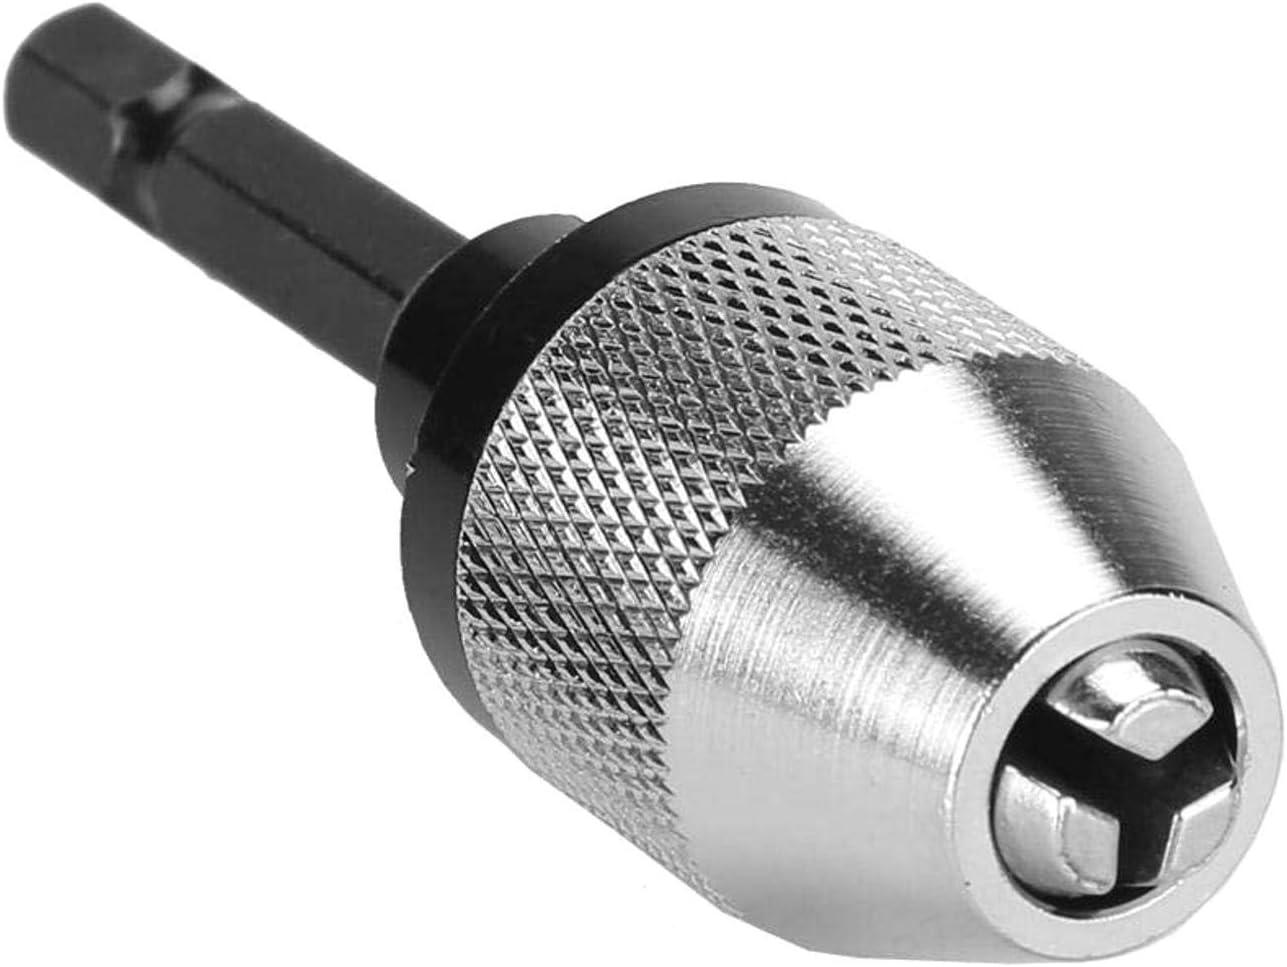 SALAKA Destornillador el/éctrico de v/ástago Hexagonal de 6,5 mm Adaptador de portabrocas Portabrocas convertidor de Cambio r/ápido Portabrocas H01335